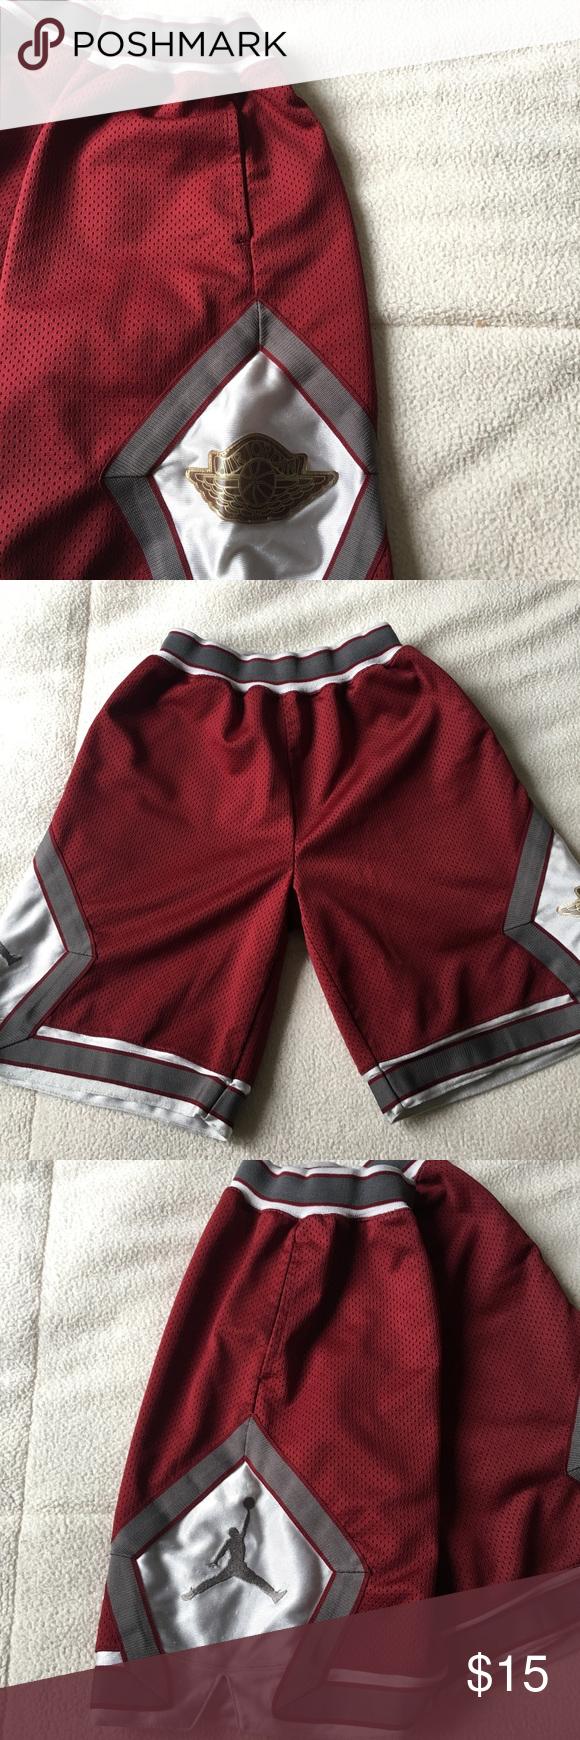 9c085f5c850894 Air Jordan Basketball Shorts